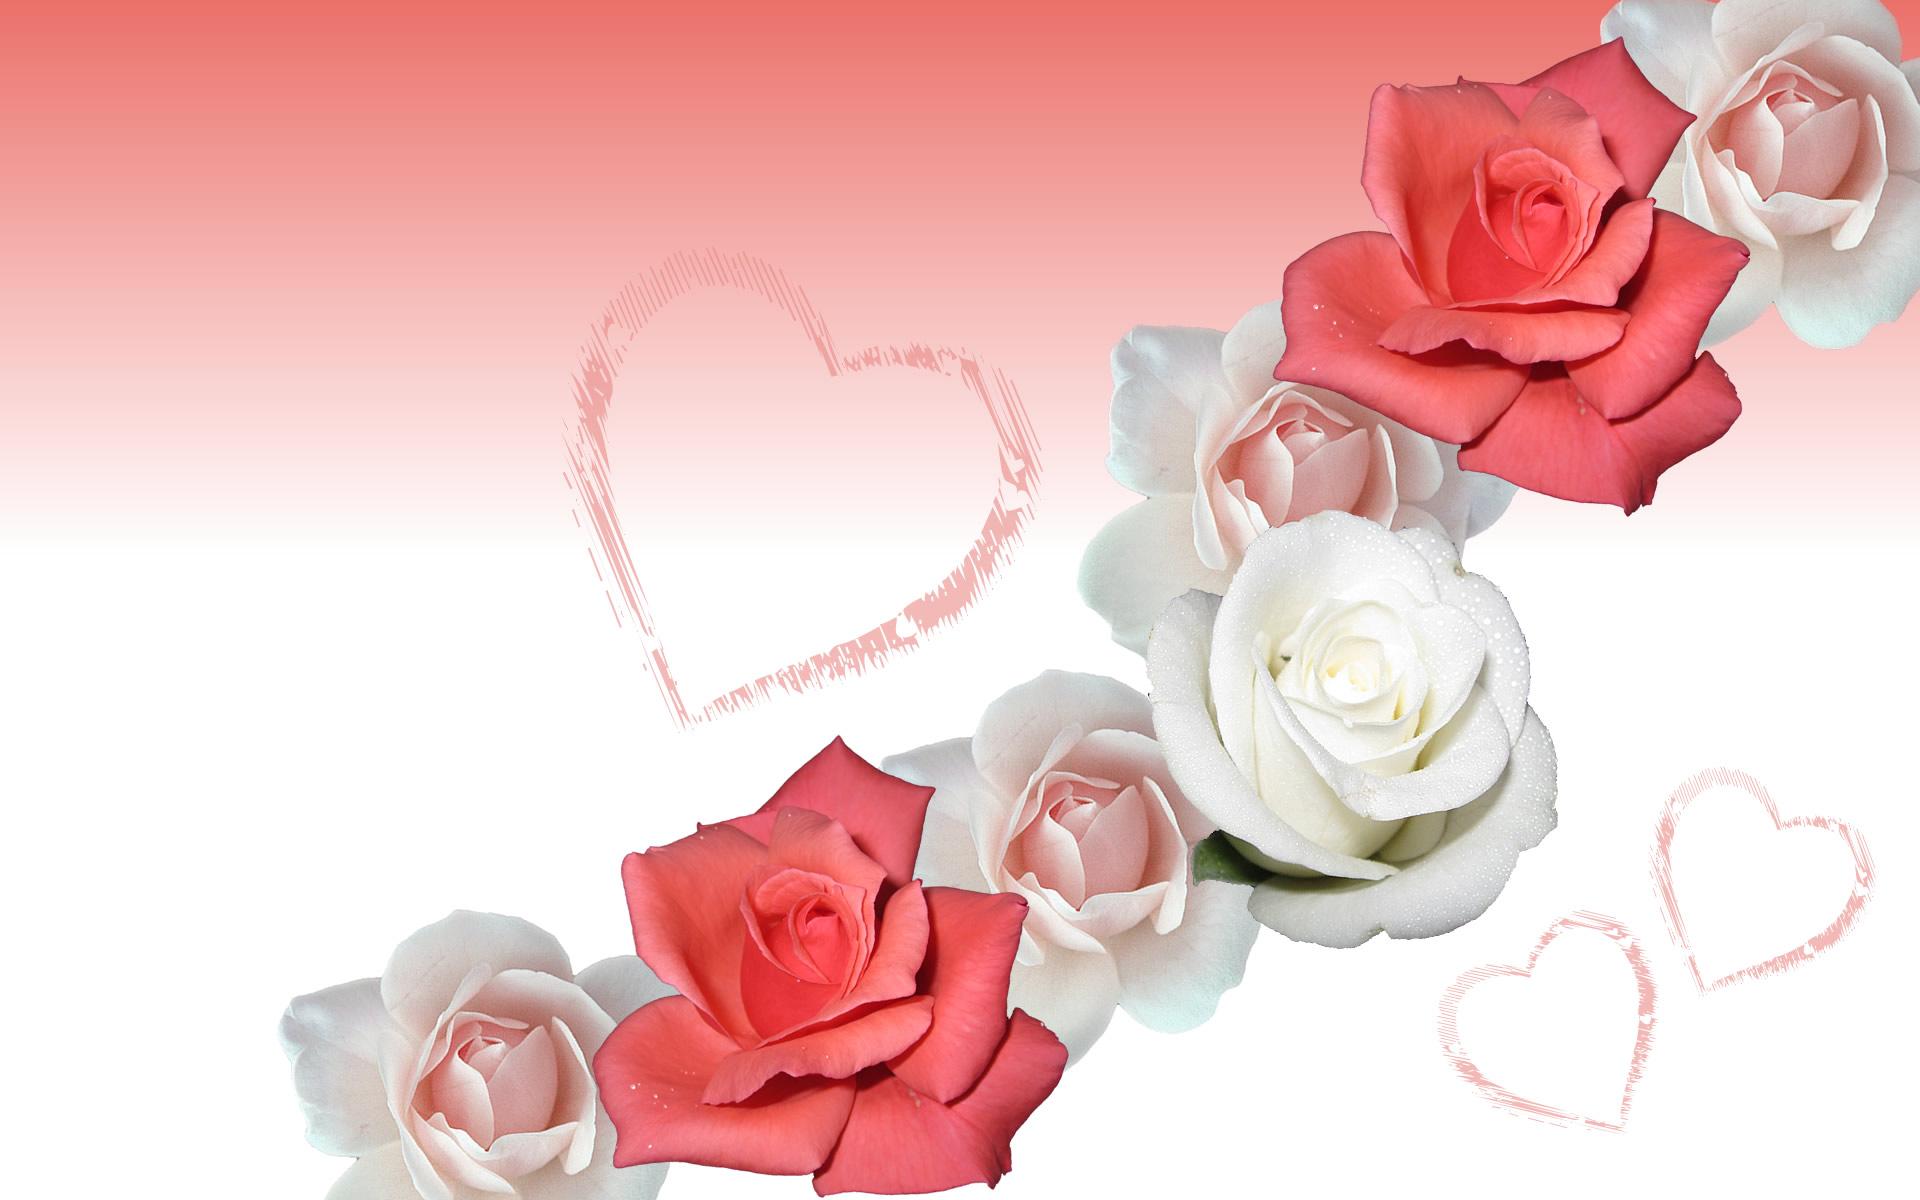 رومانسيه رومانسيه 13784587202.jpg